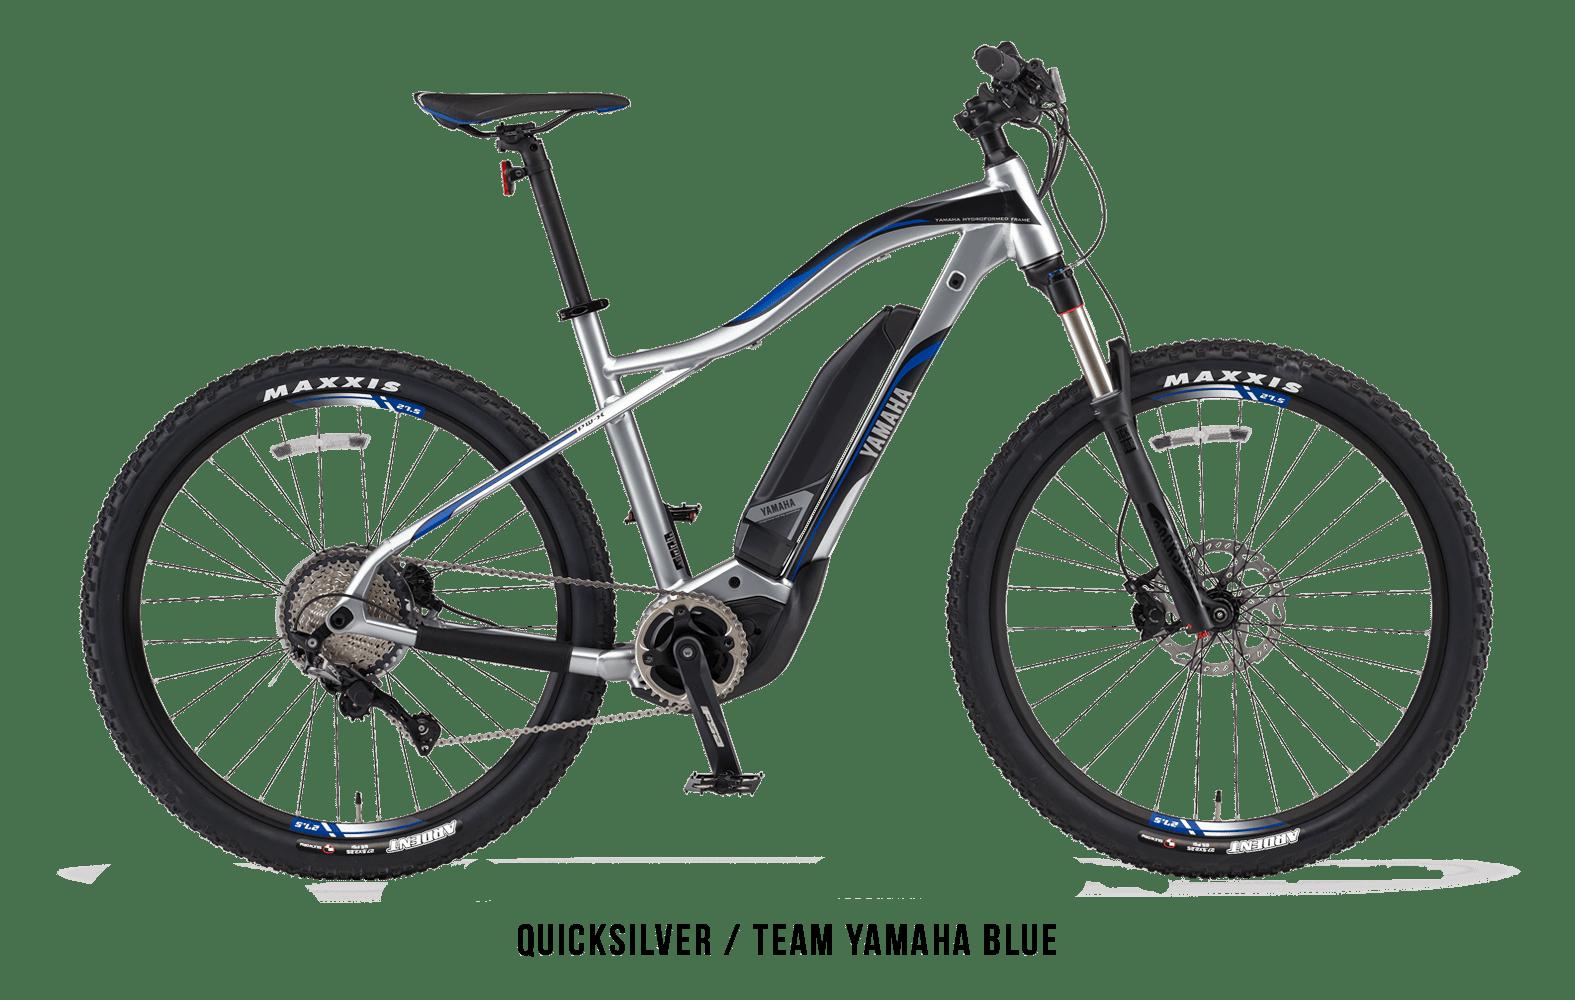 yamaha electric bicycles, e-bikes, YDX-TORC, Yamaha dealers, Gilbert, Chandler, Mesa, Queen Creek, Ahwatukee, Higley